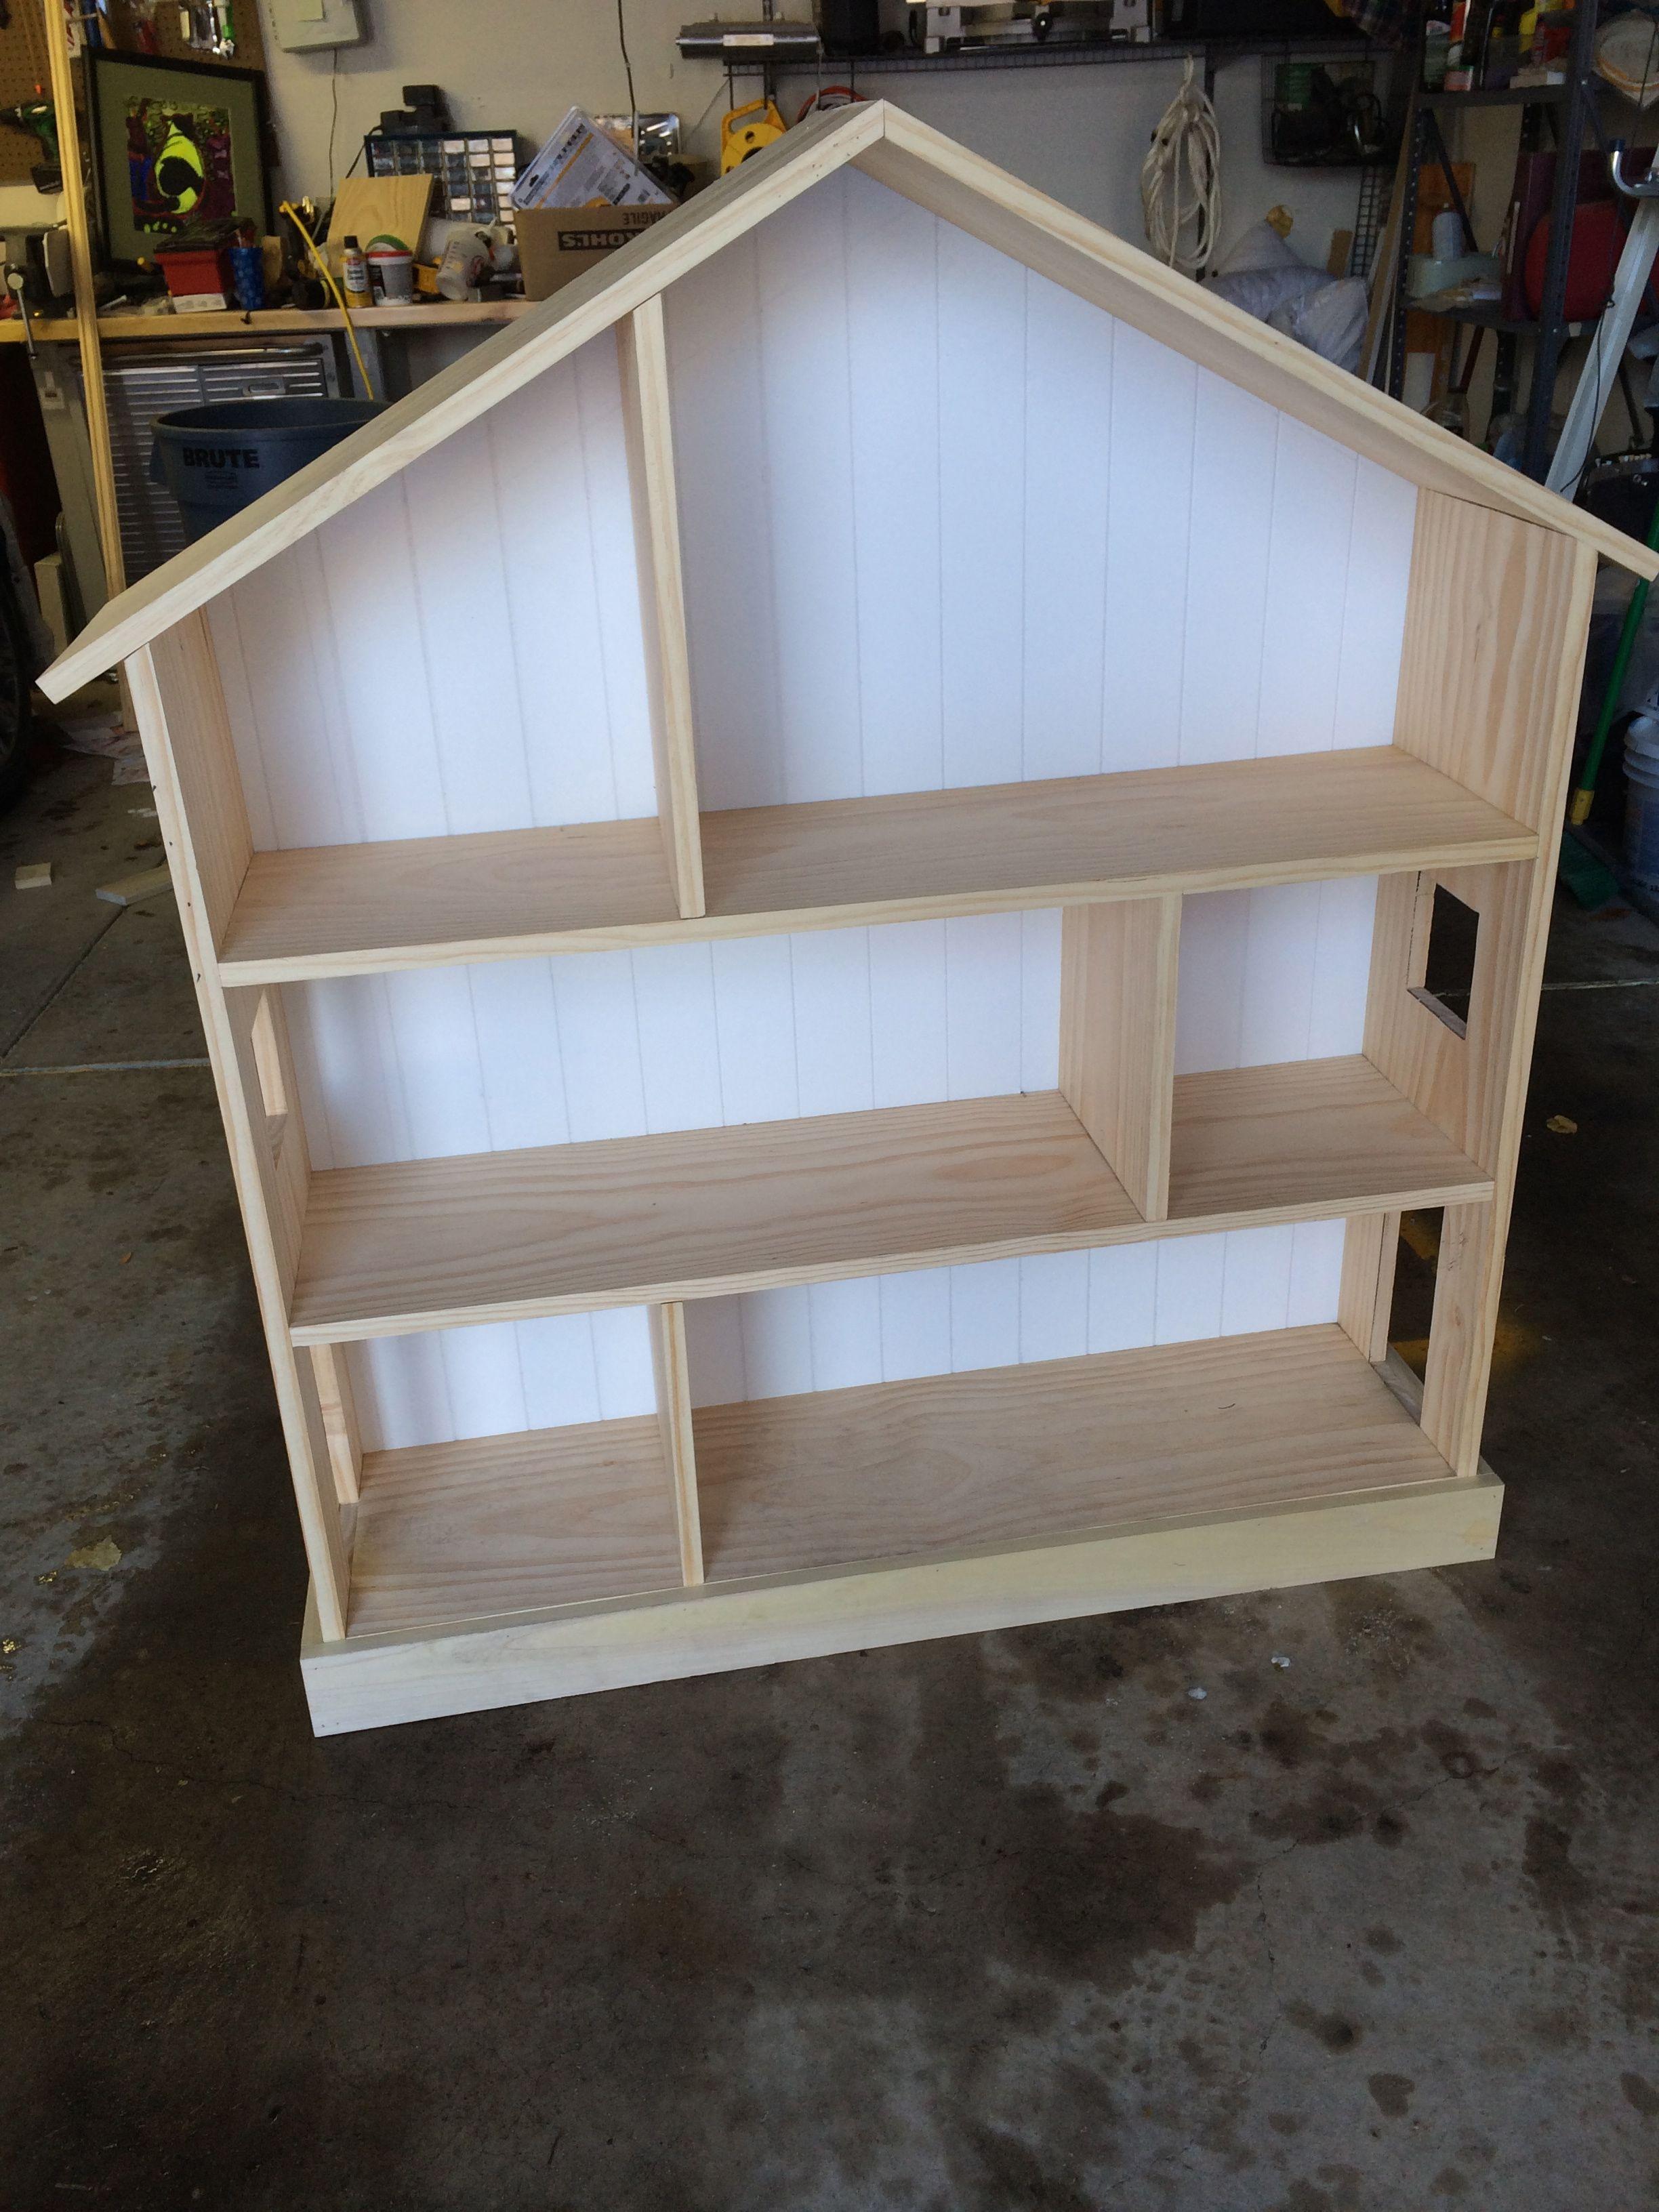 Cutest Dollhouse Bookcase To Build Yourself I Can Teach